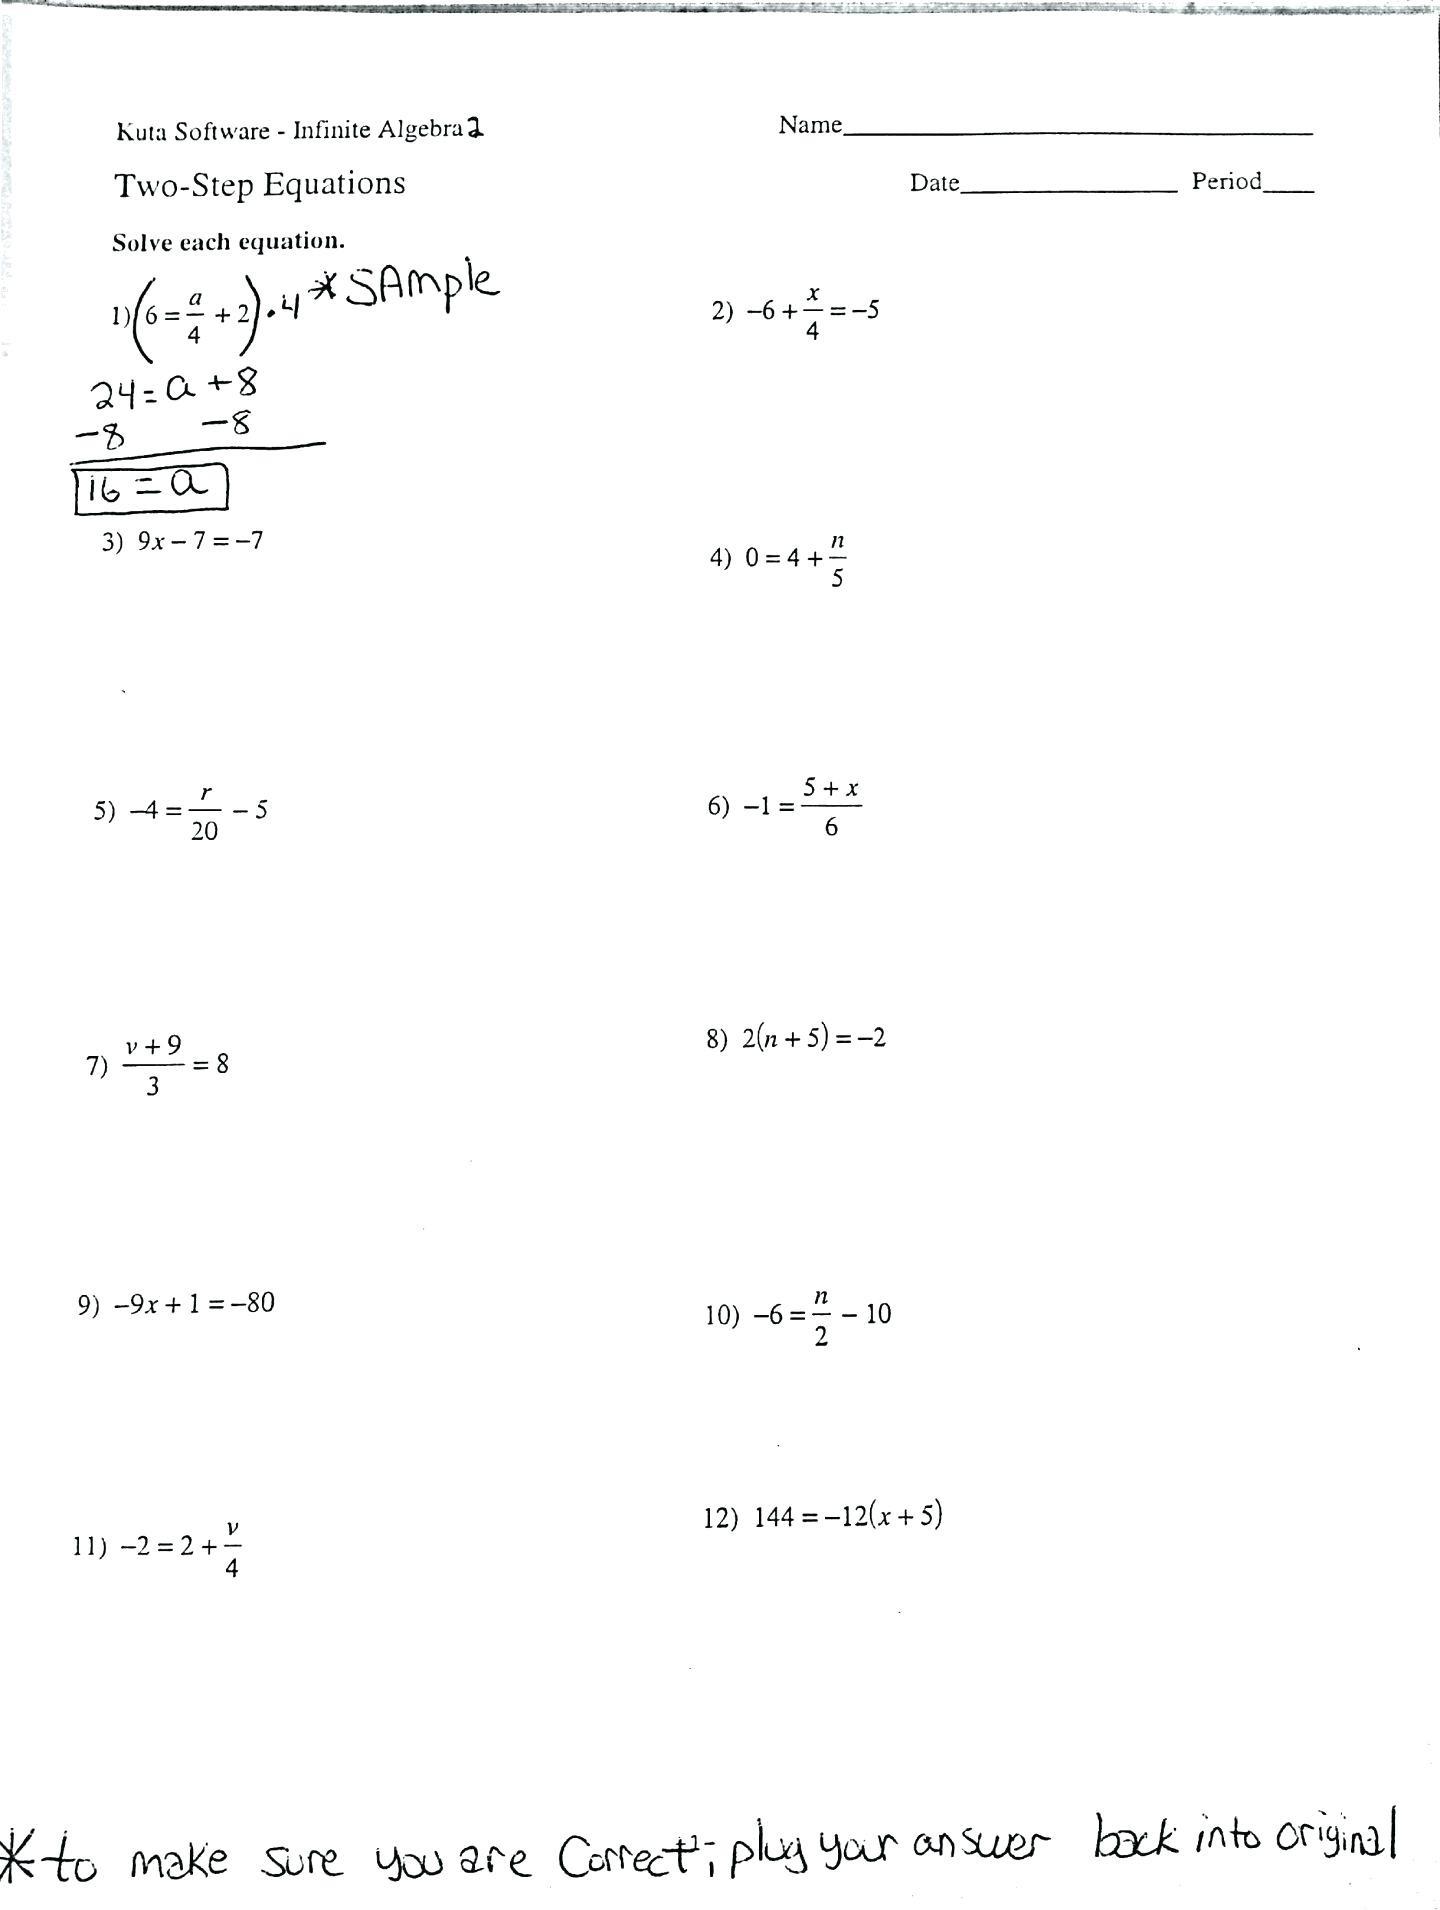 Solving One Step Equations Worksheet